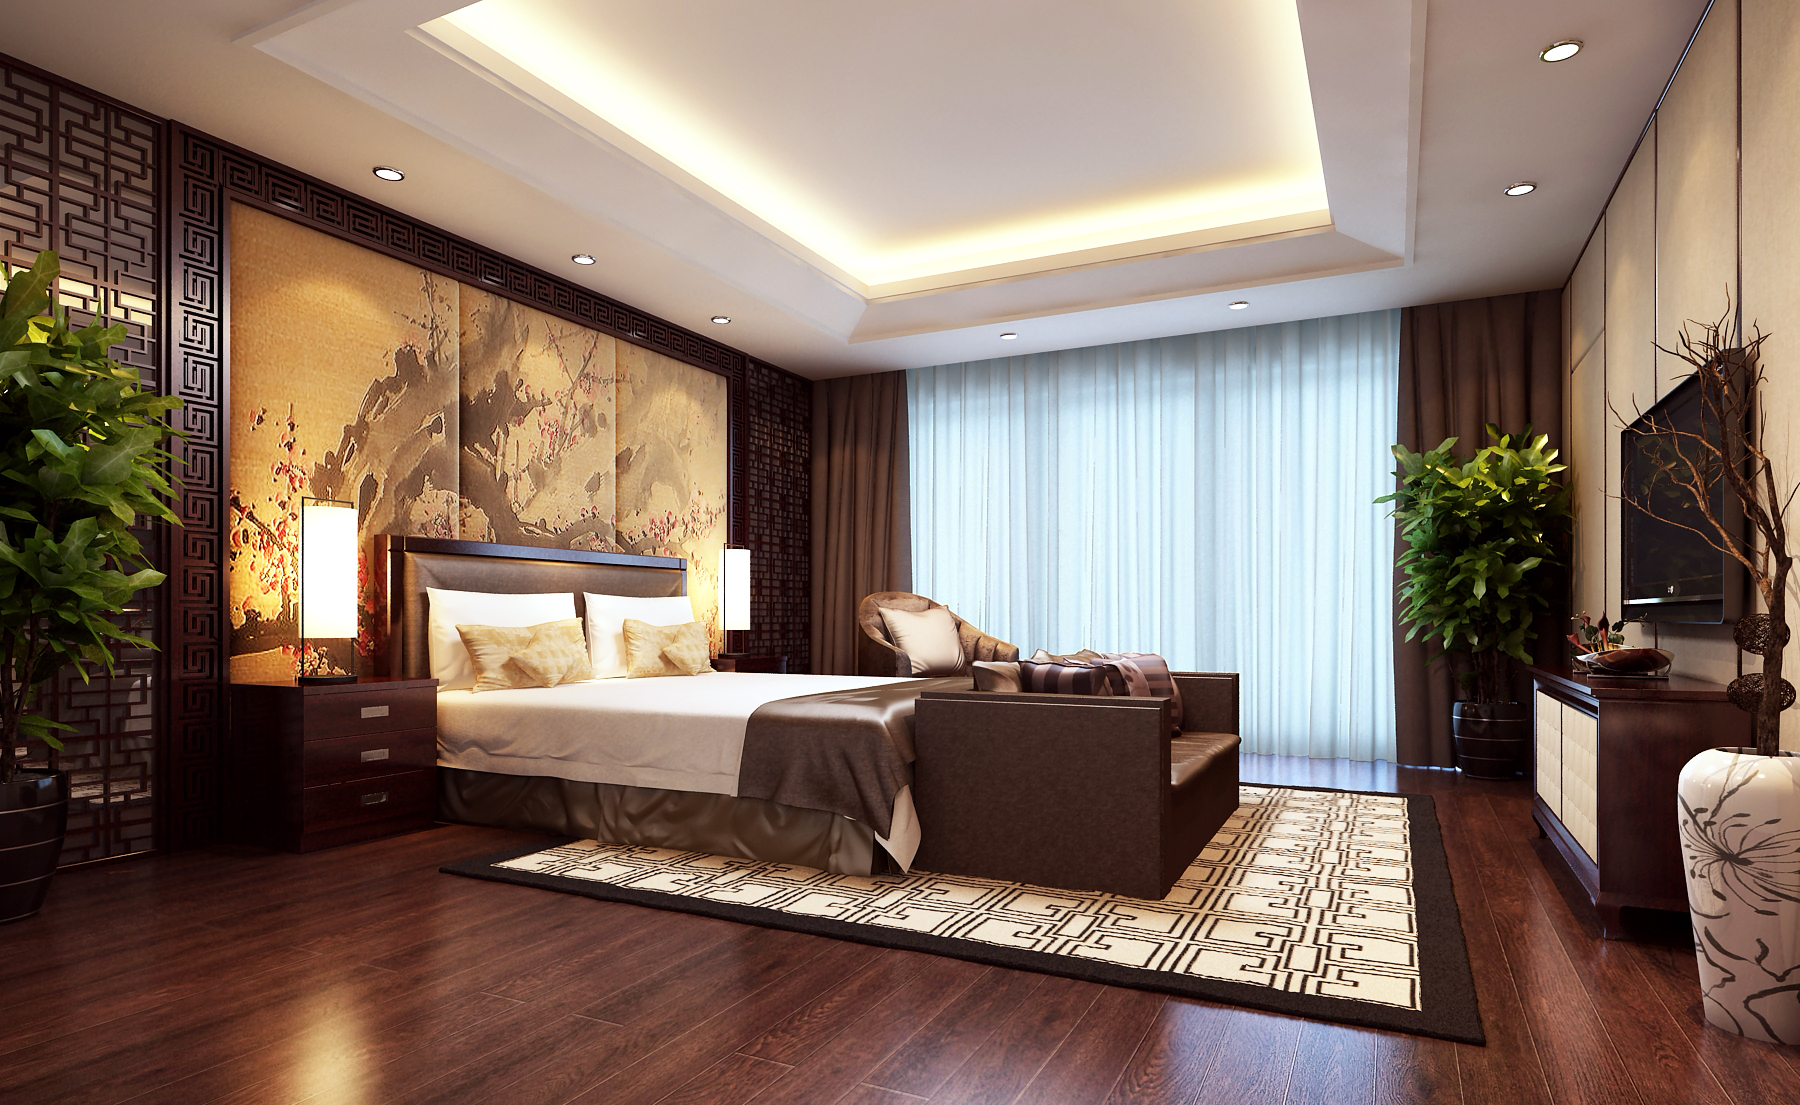 Modern Brown Bedroom 3D Model MAX   CGTrader.com on New Model Bedroom Design  id=56270